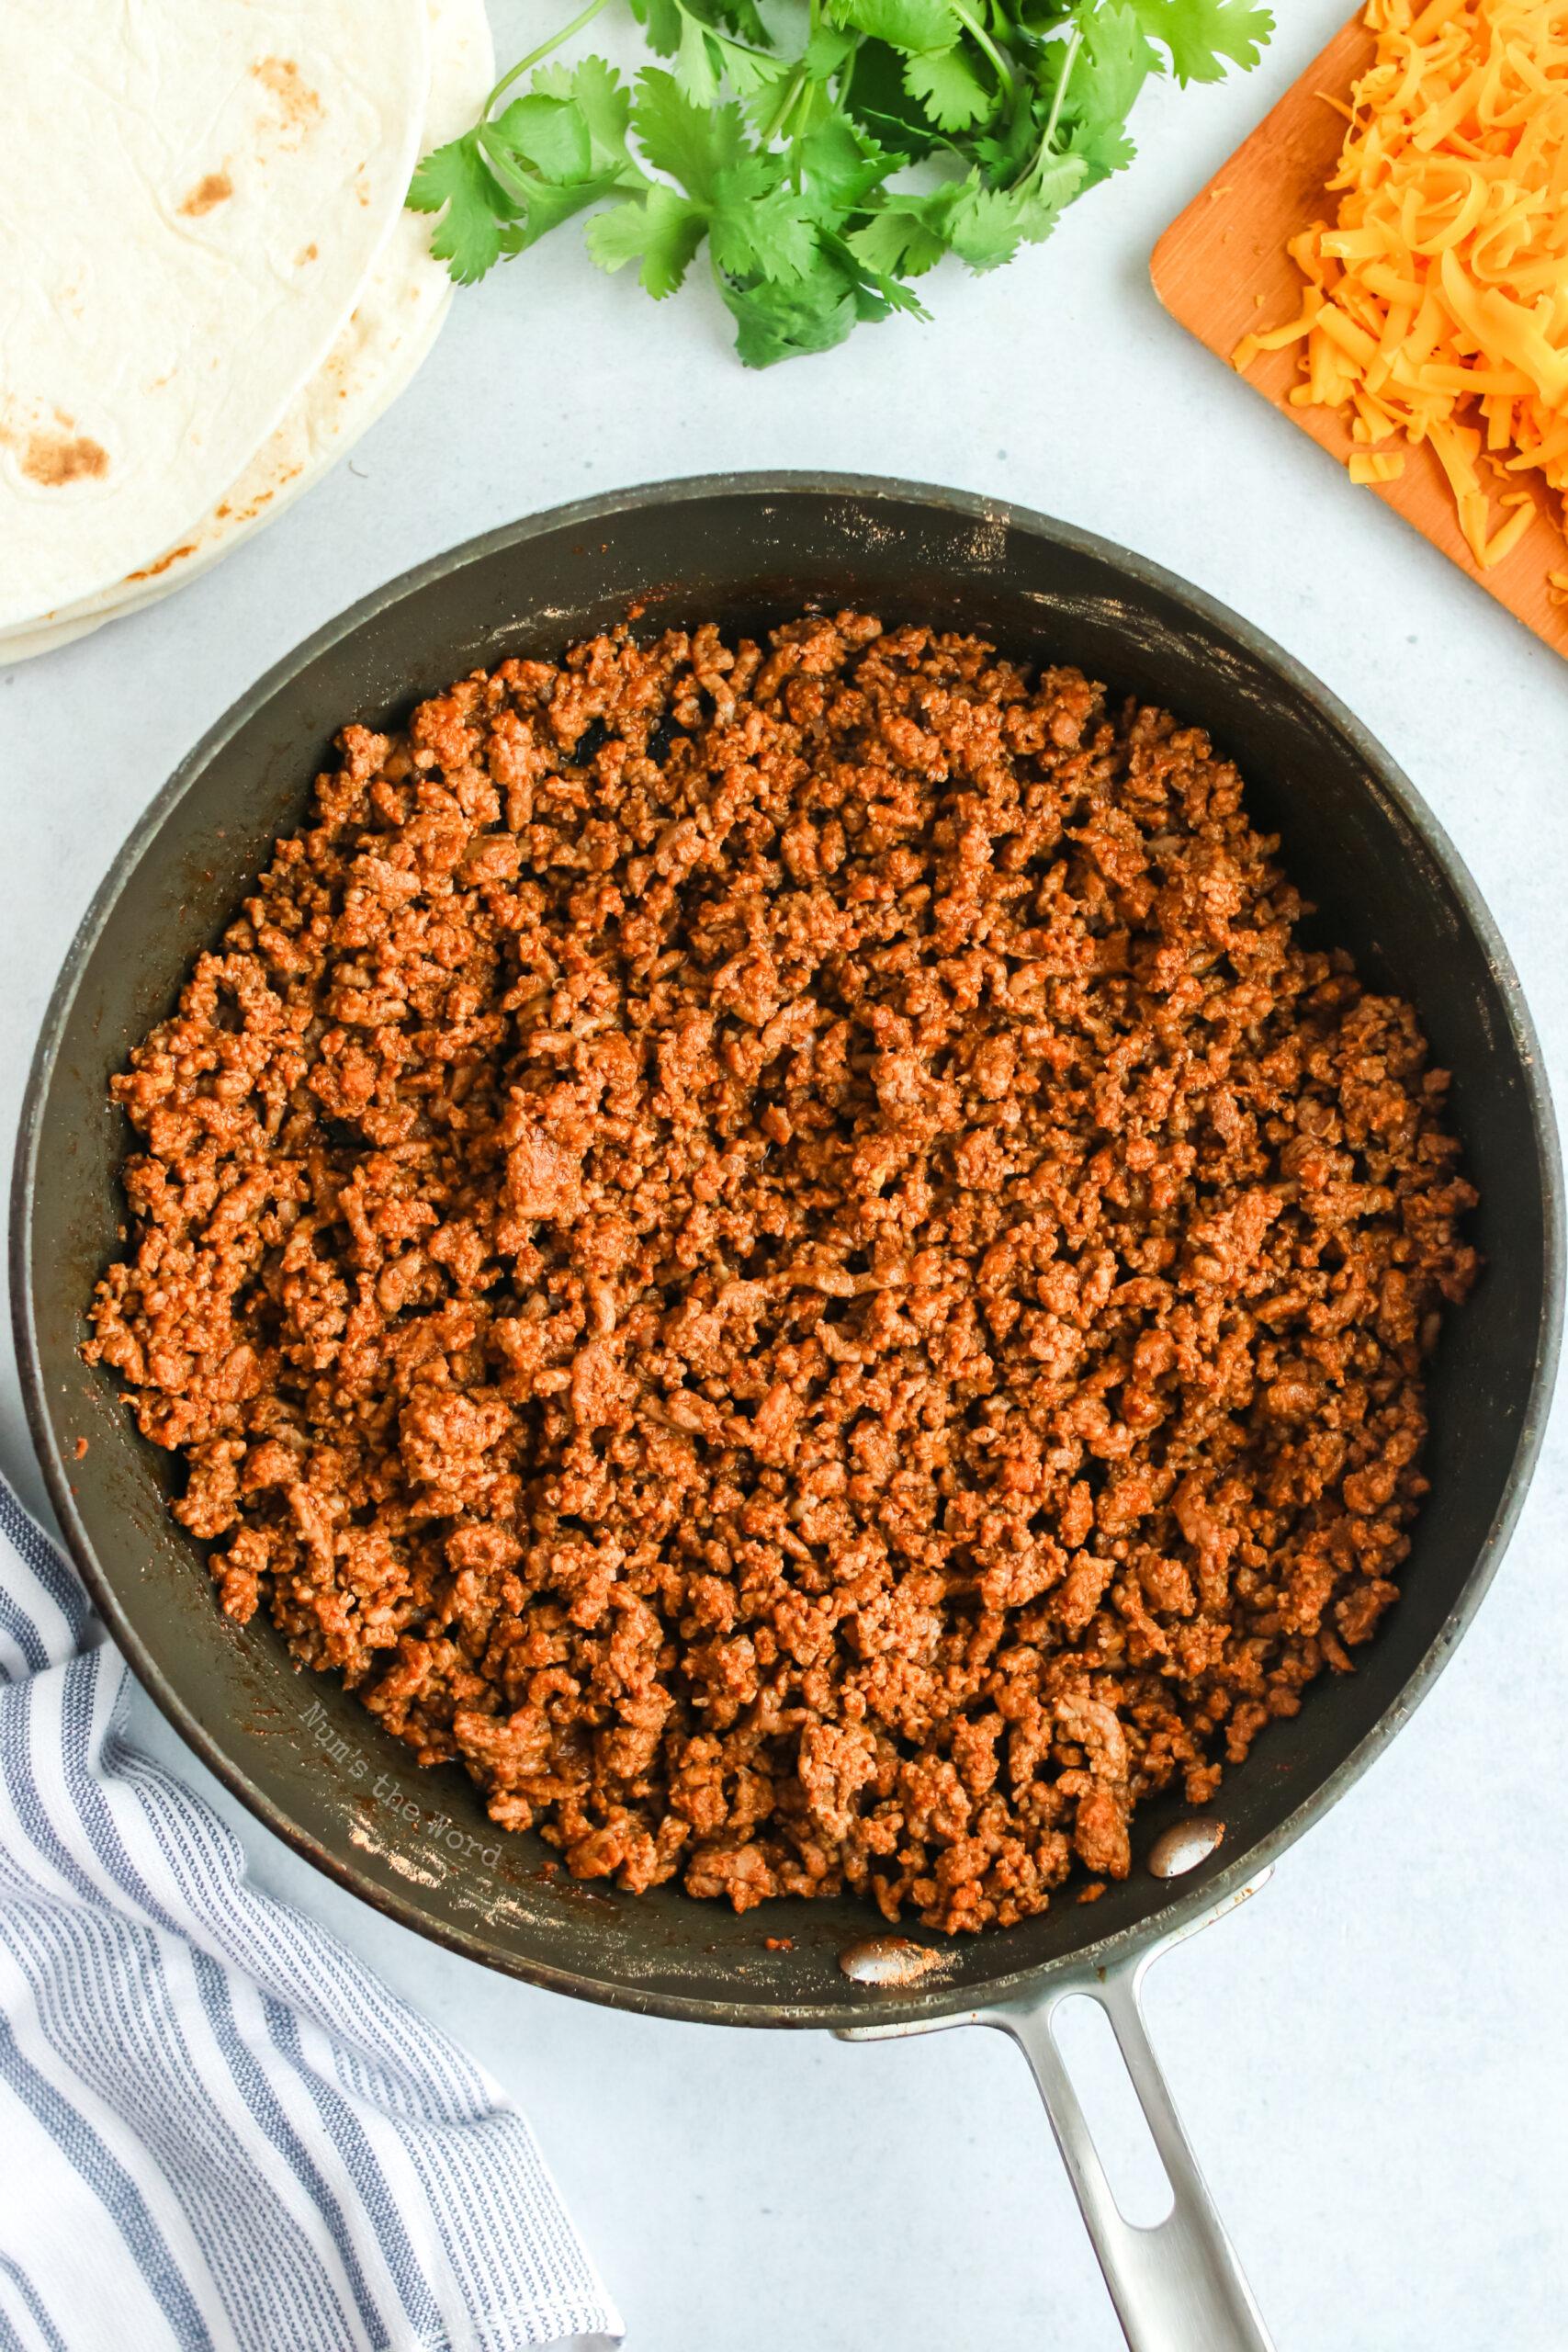 ground beef mixture in a skillet.